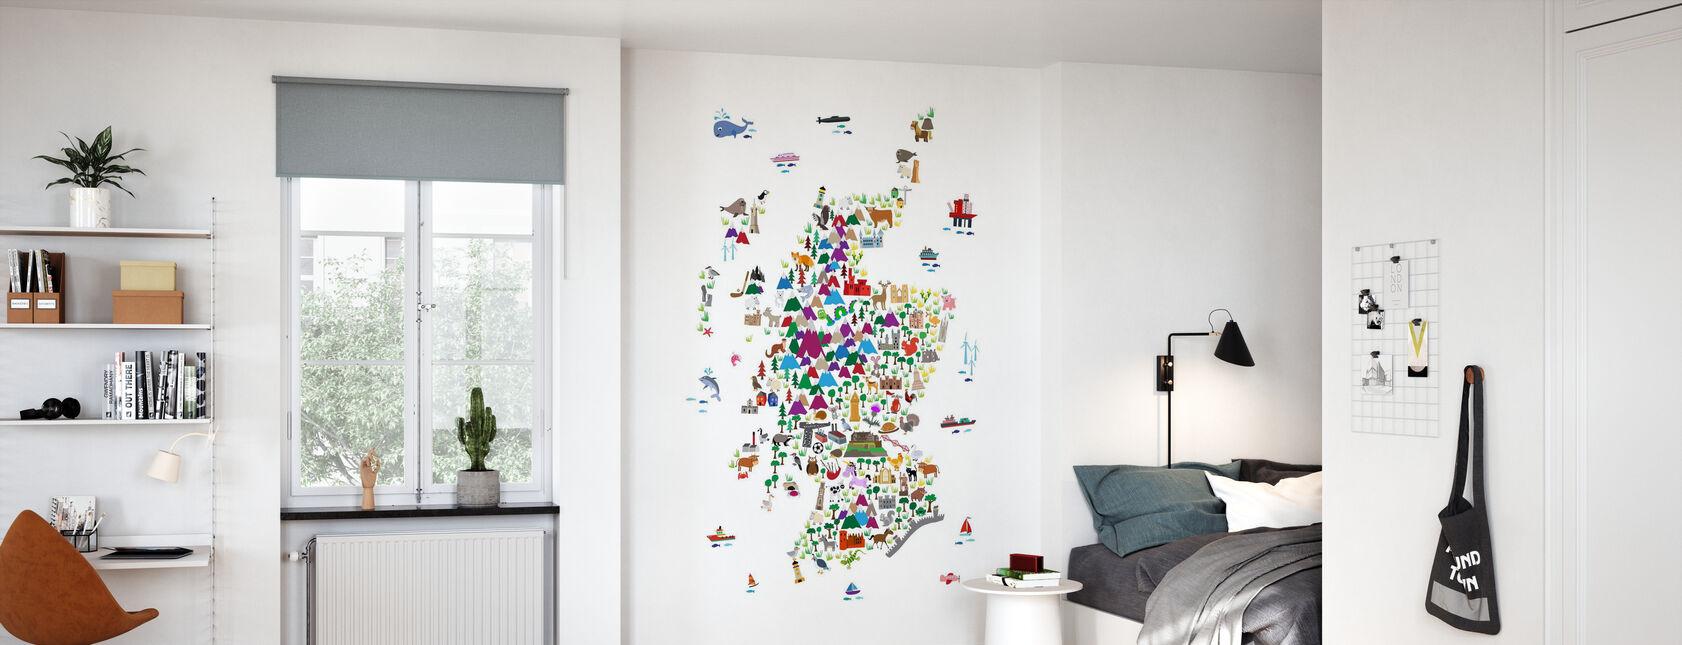 Animal Map - Scotland - Wallpaper - Kids Room